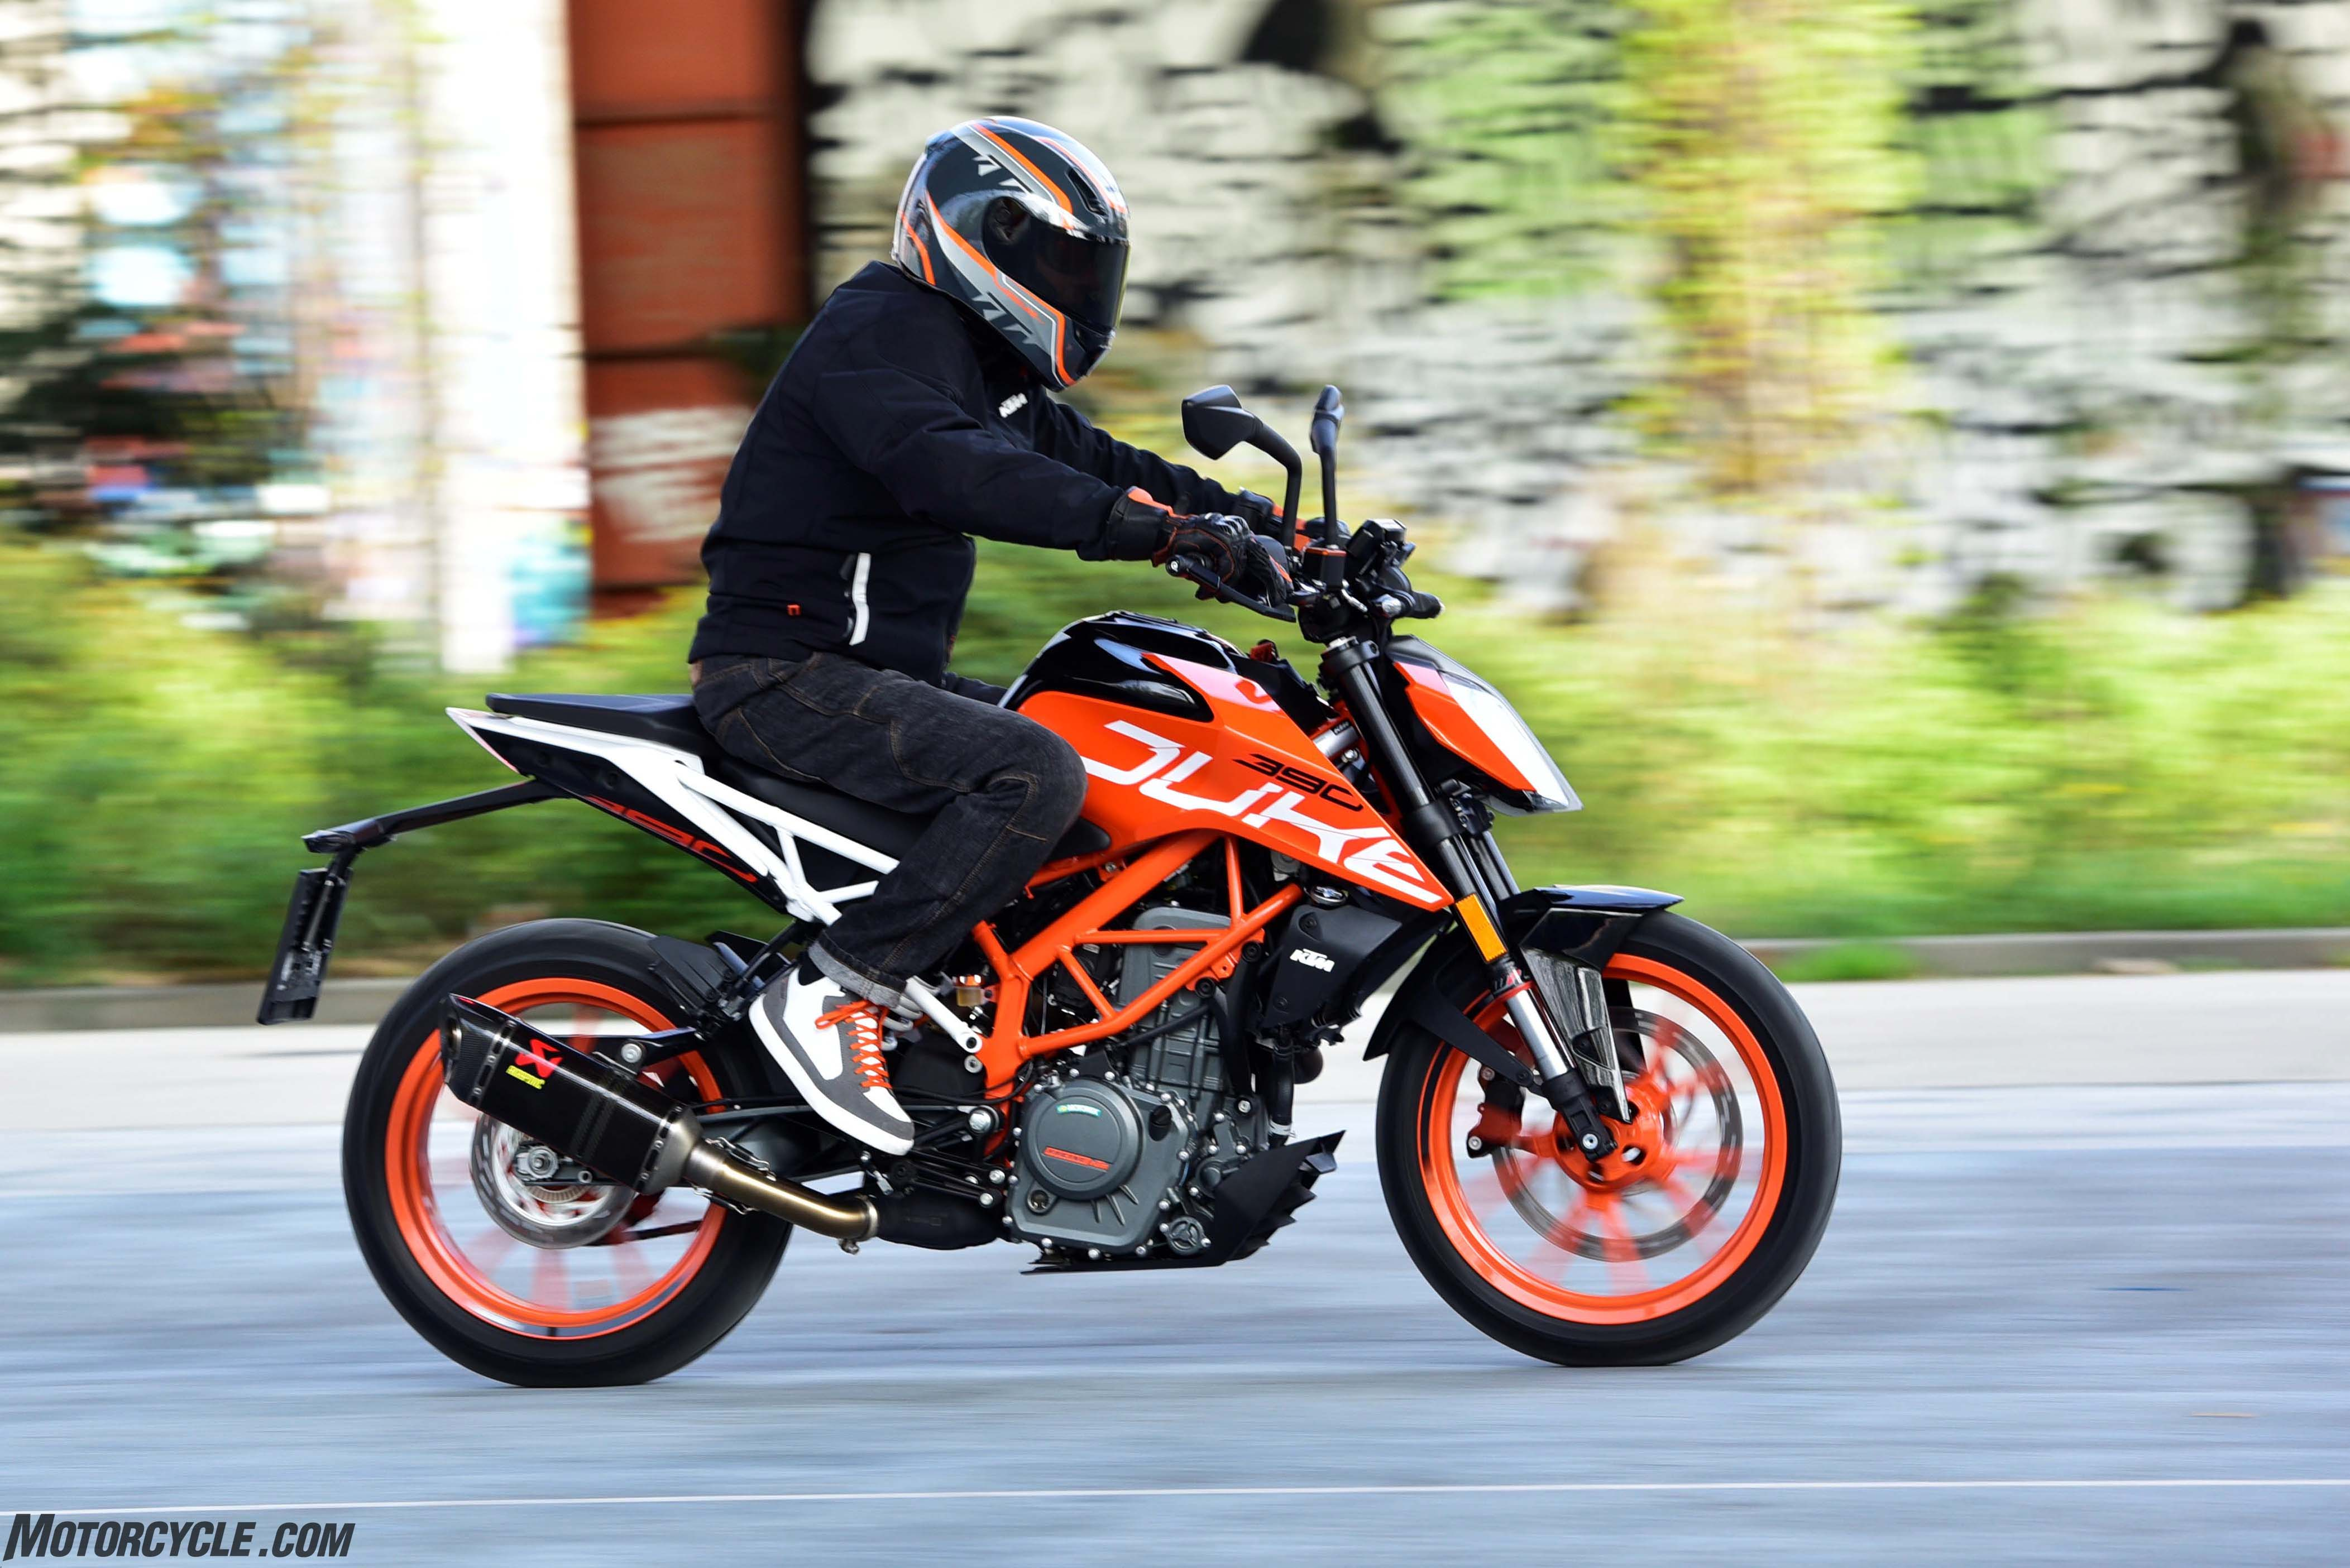 [motorcyclecom]   2017 KTM 390 Duke Review crf250lorg 4209x2809